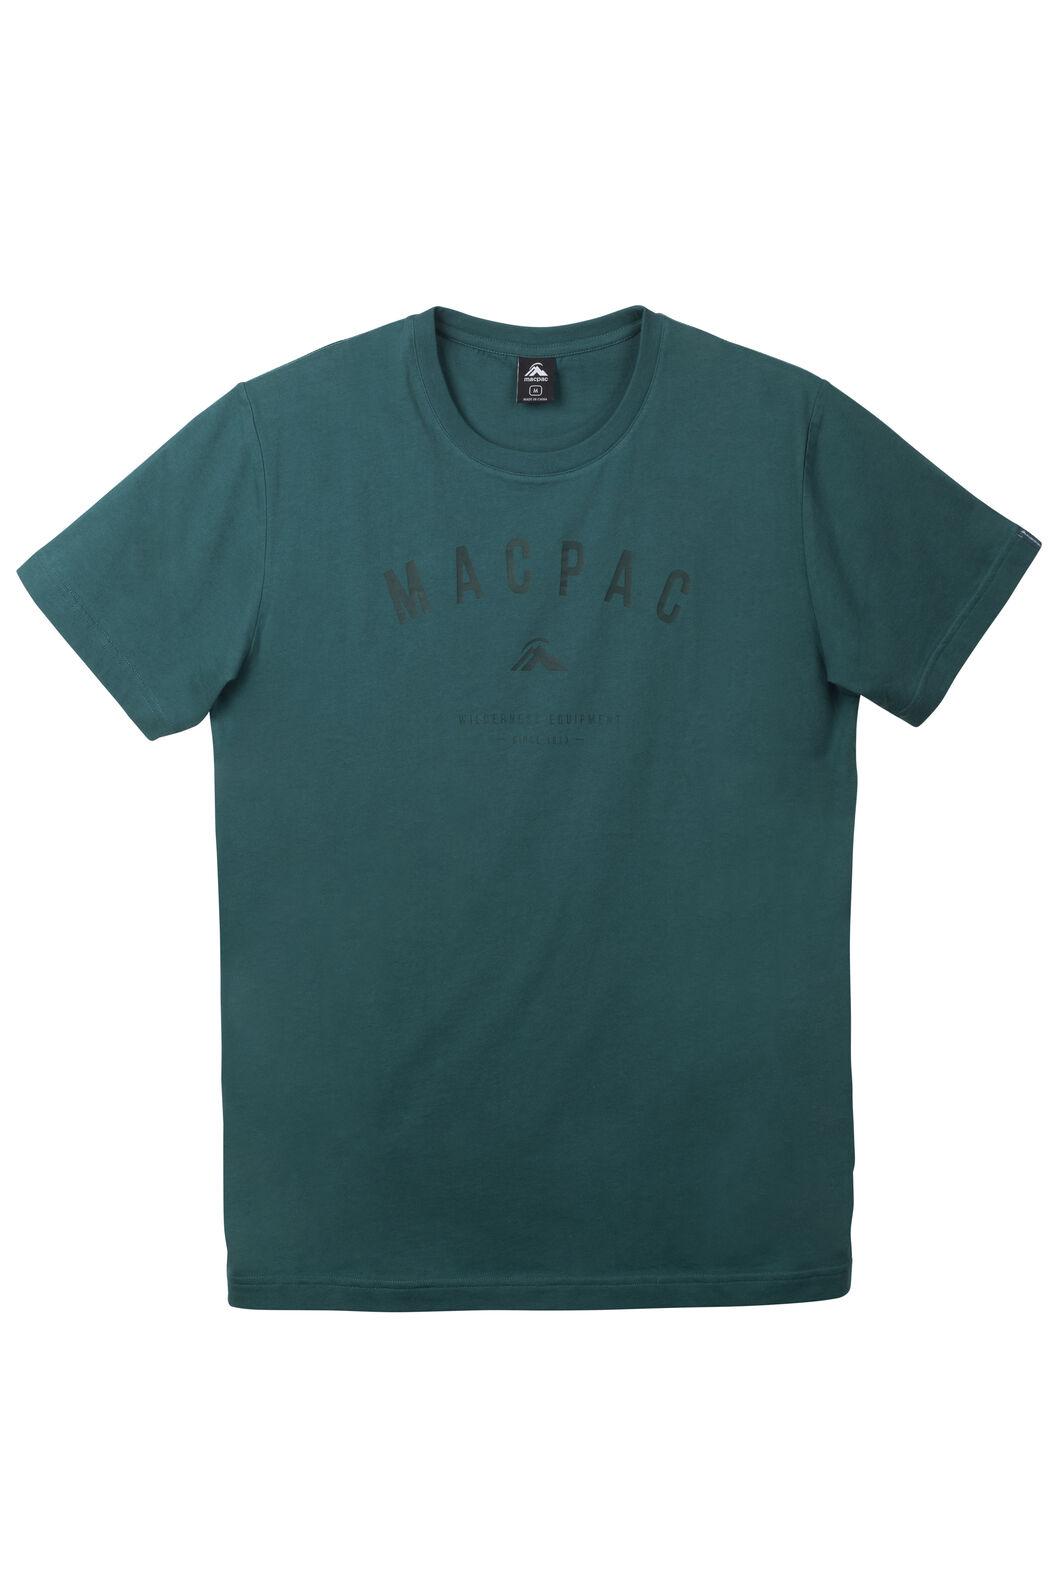 Macpac Graphic Organic Cotton T-Shirt - Men's, Pacific, hi-res